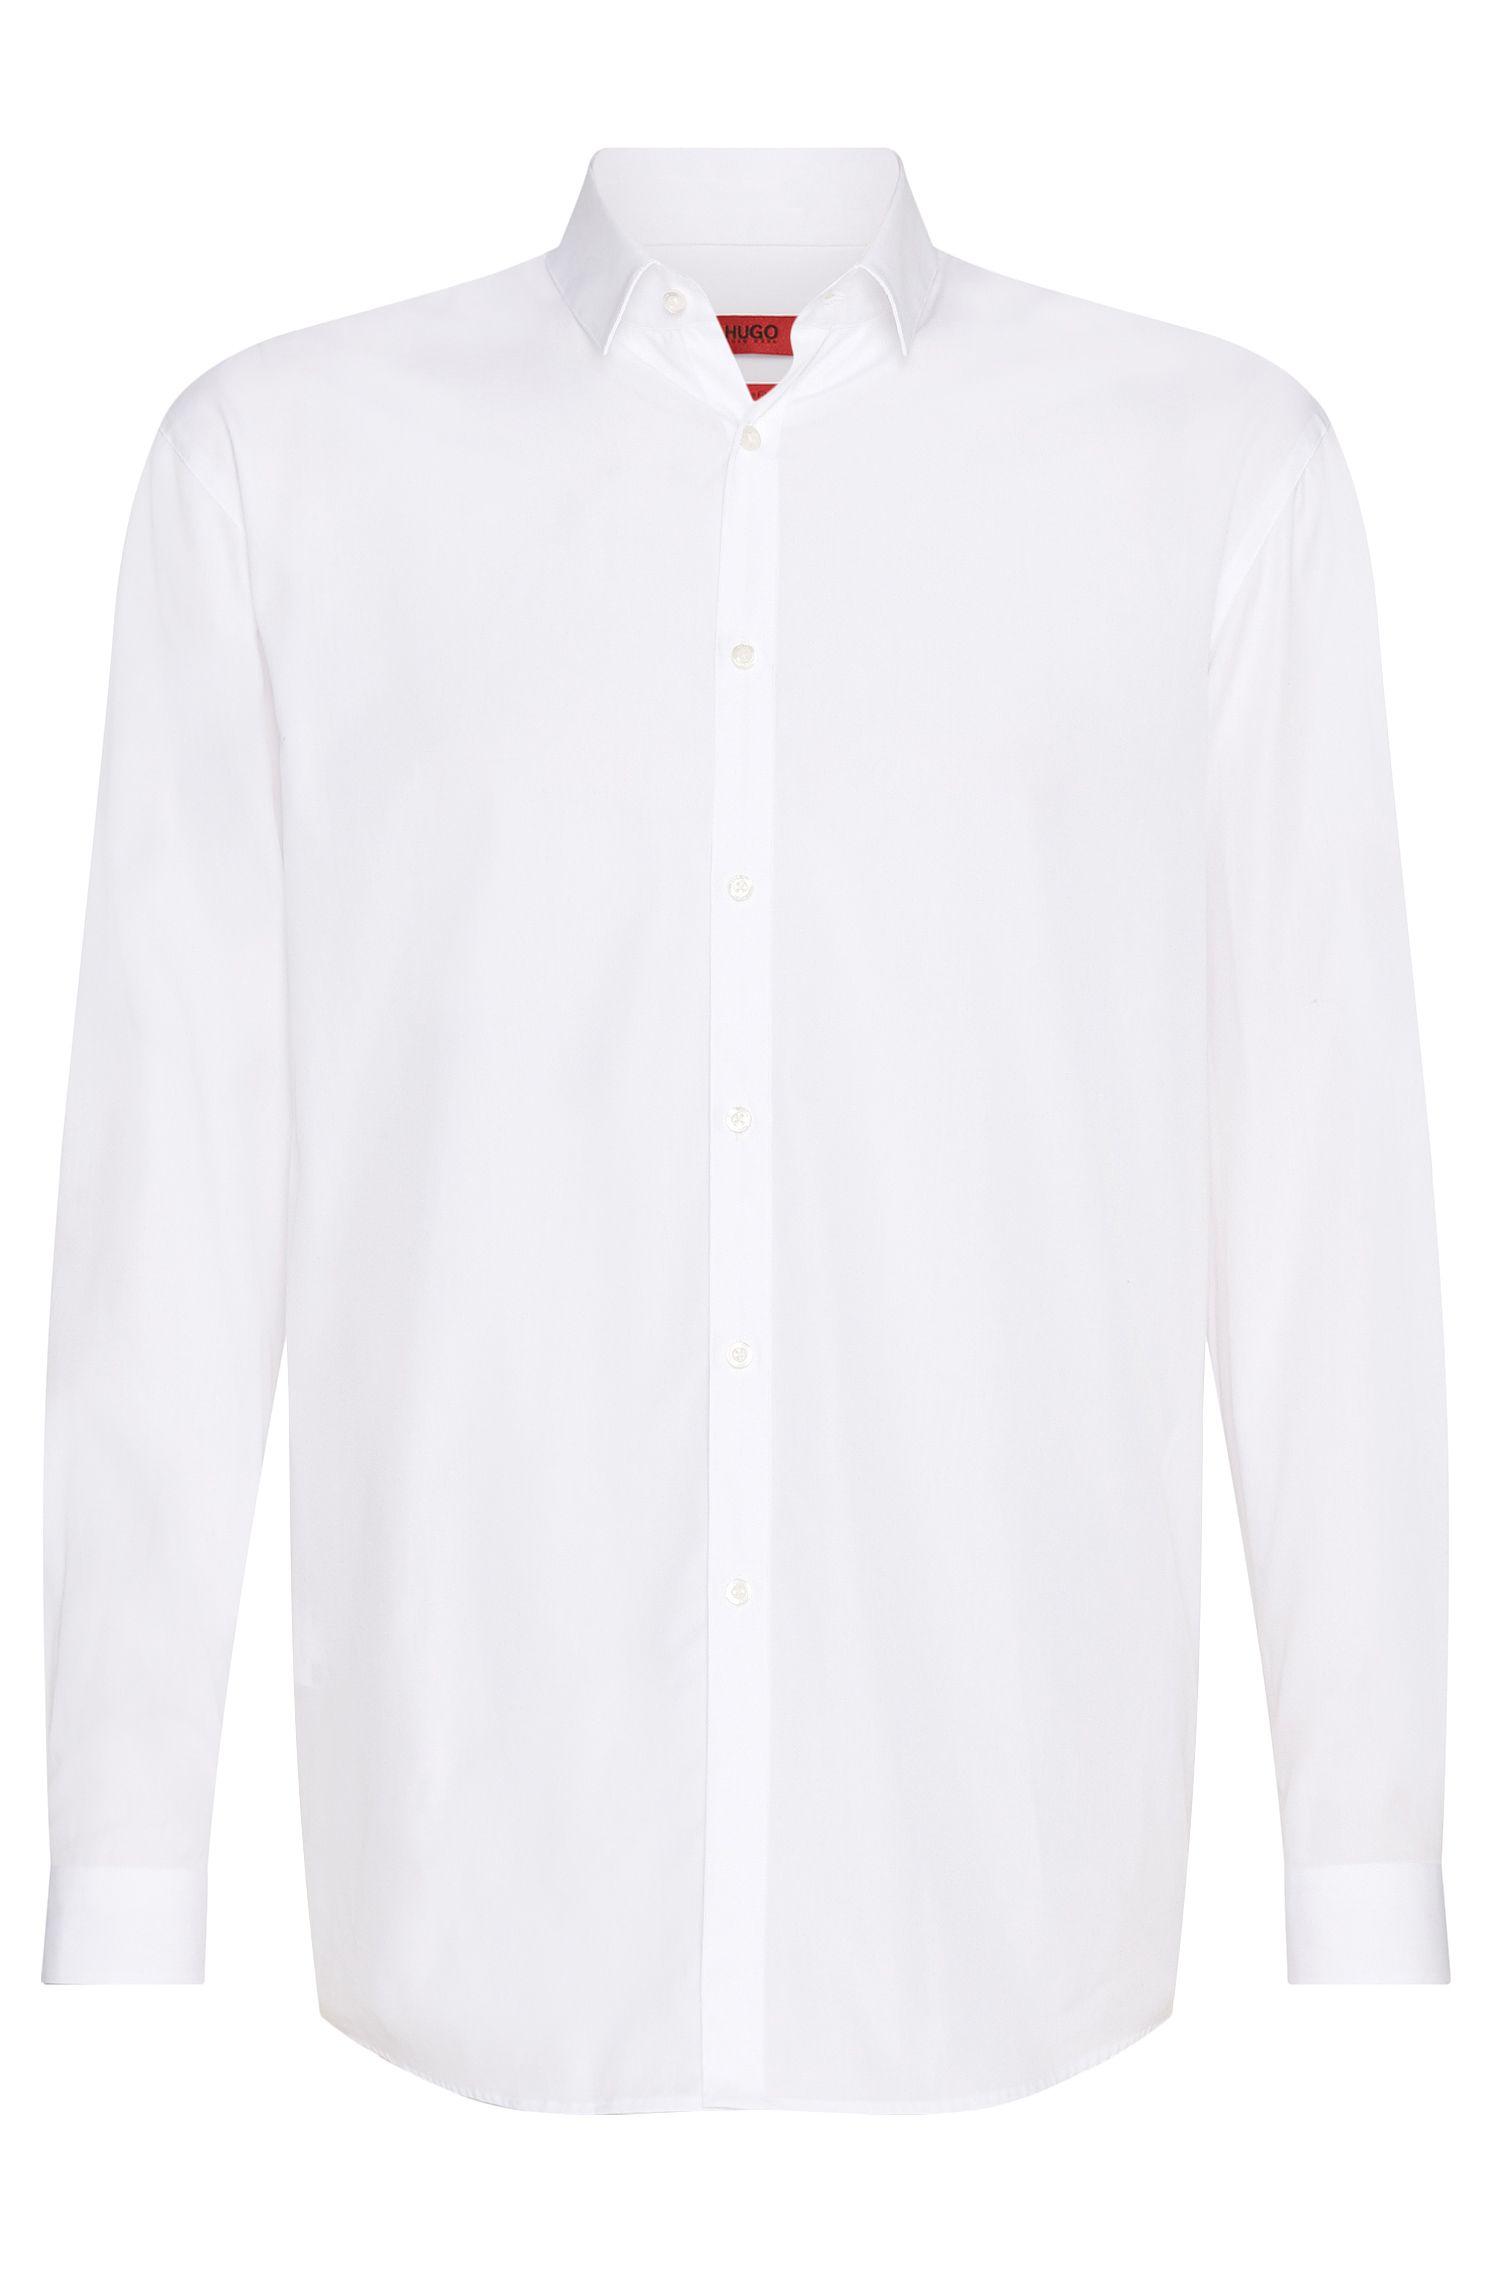 'Erolino' | Regular Fit, Cotton Button Down Shirt